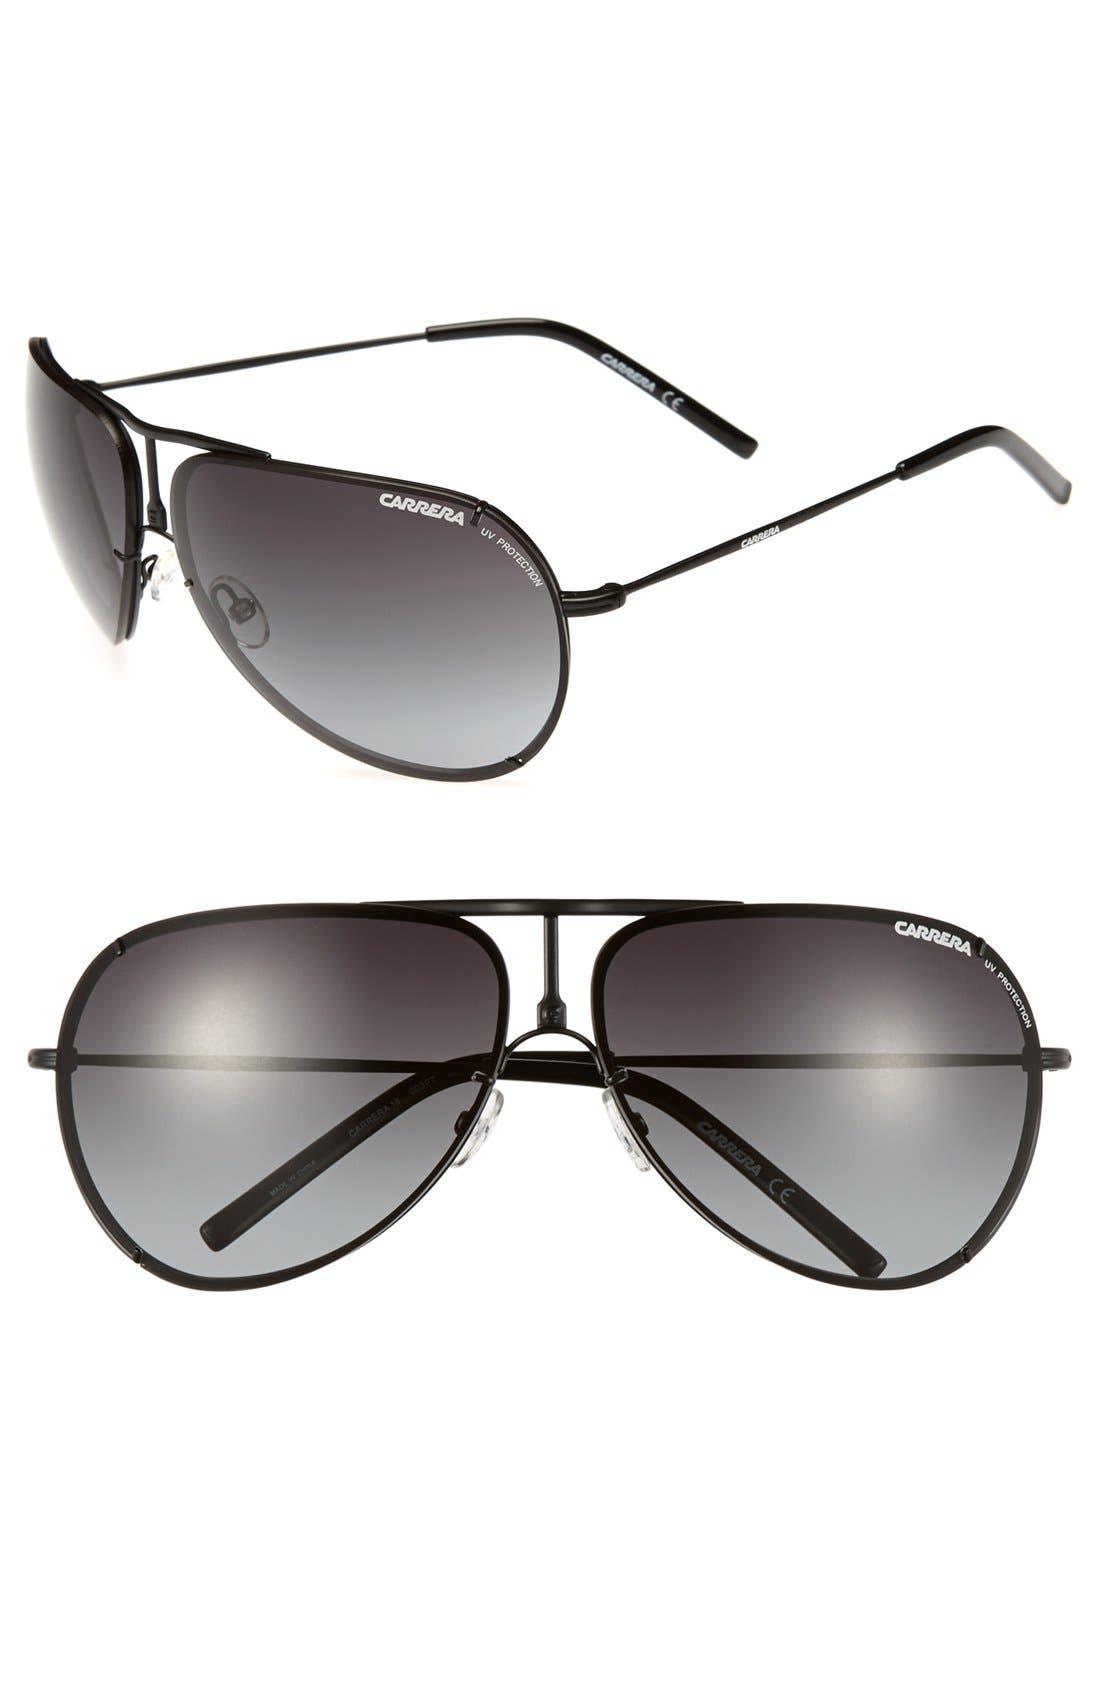 Alternate Image 1 Selected - Carrera Eyewear 67mm Aviator Sunglasses